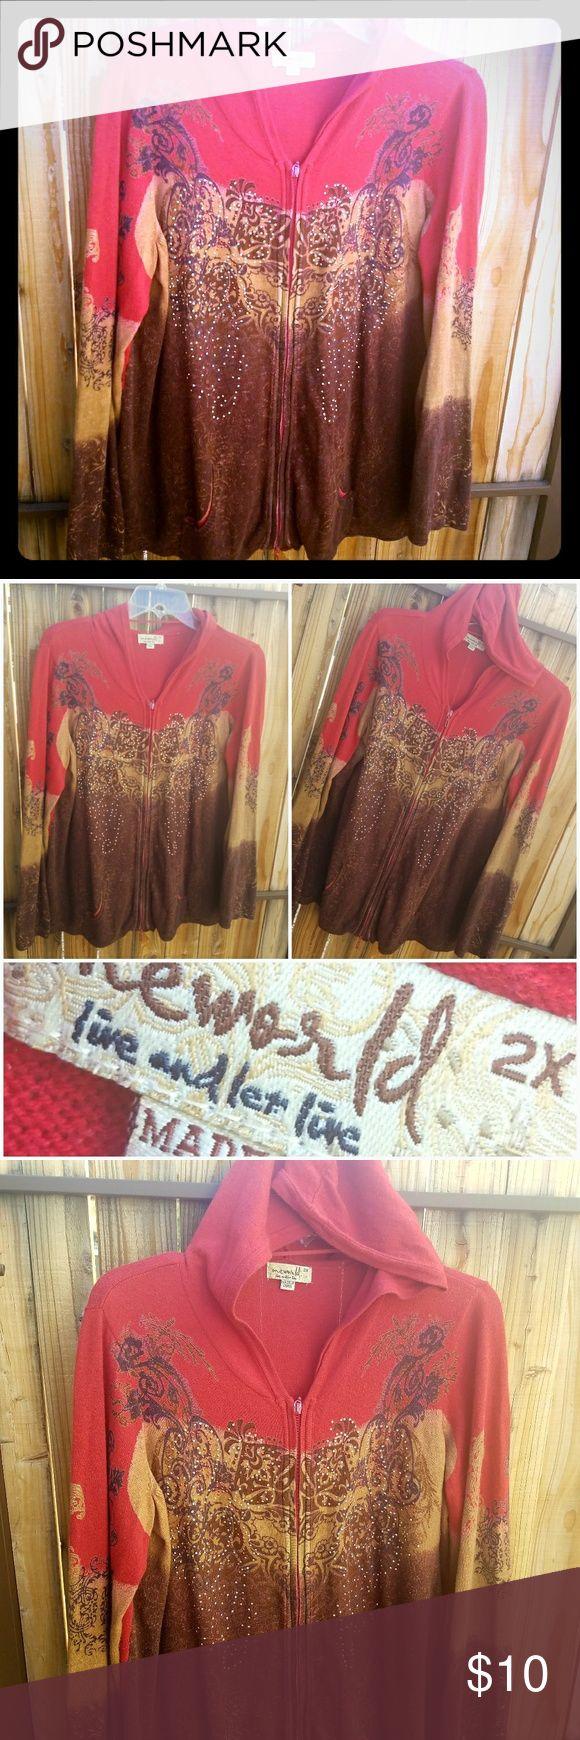 BeDAZZLED Women's Hoodie Rust/Reddish colored Hoodie zips up. 💖  Bedazzled with metal studded design.   #CasualChic #Windbreaker #Fall #FAshion Tops Sweatshirts & Hoodies